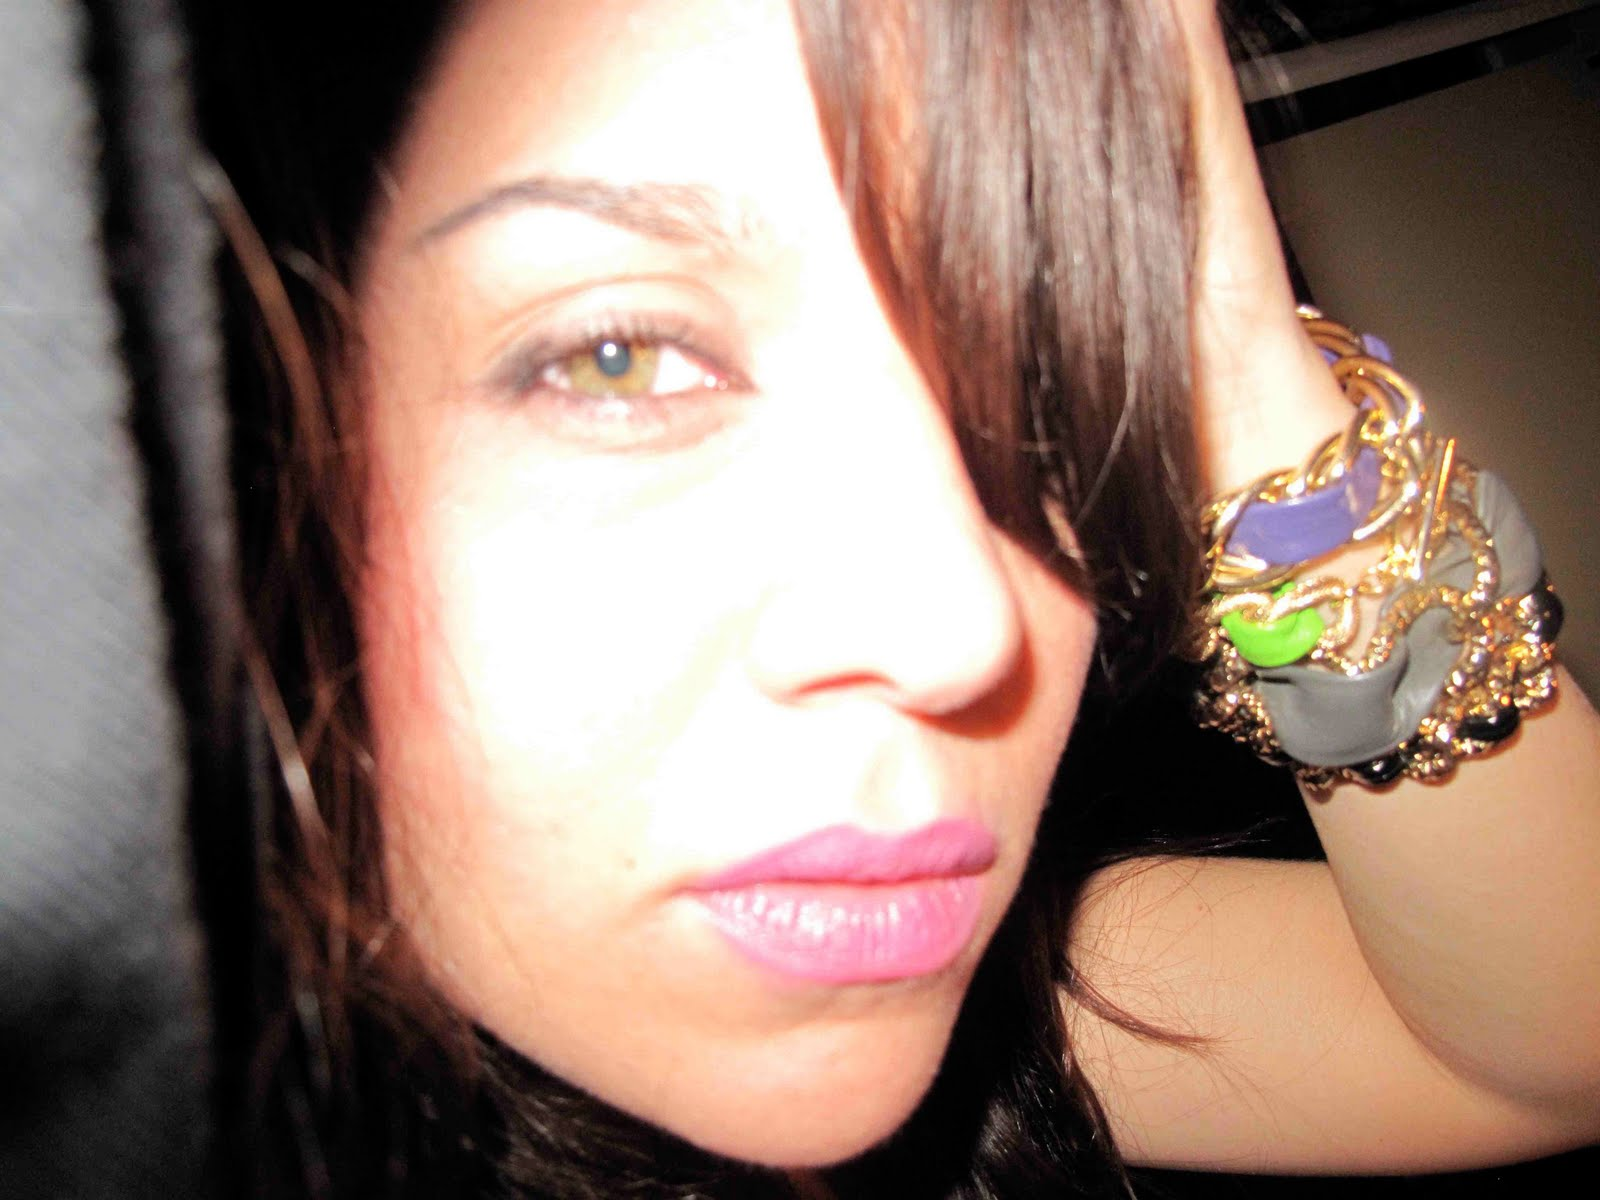 http://1.bp.blogspot.com/_icrRgLdl-7M/S_cp2ZIKMsI/AAAAAAAAAuI/e82xij_Q2to/s1600/Annie4.jpg